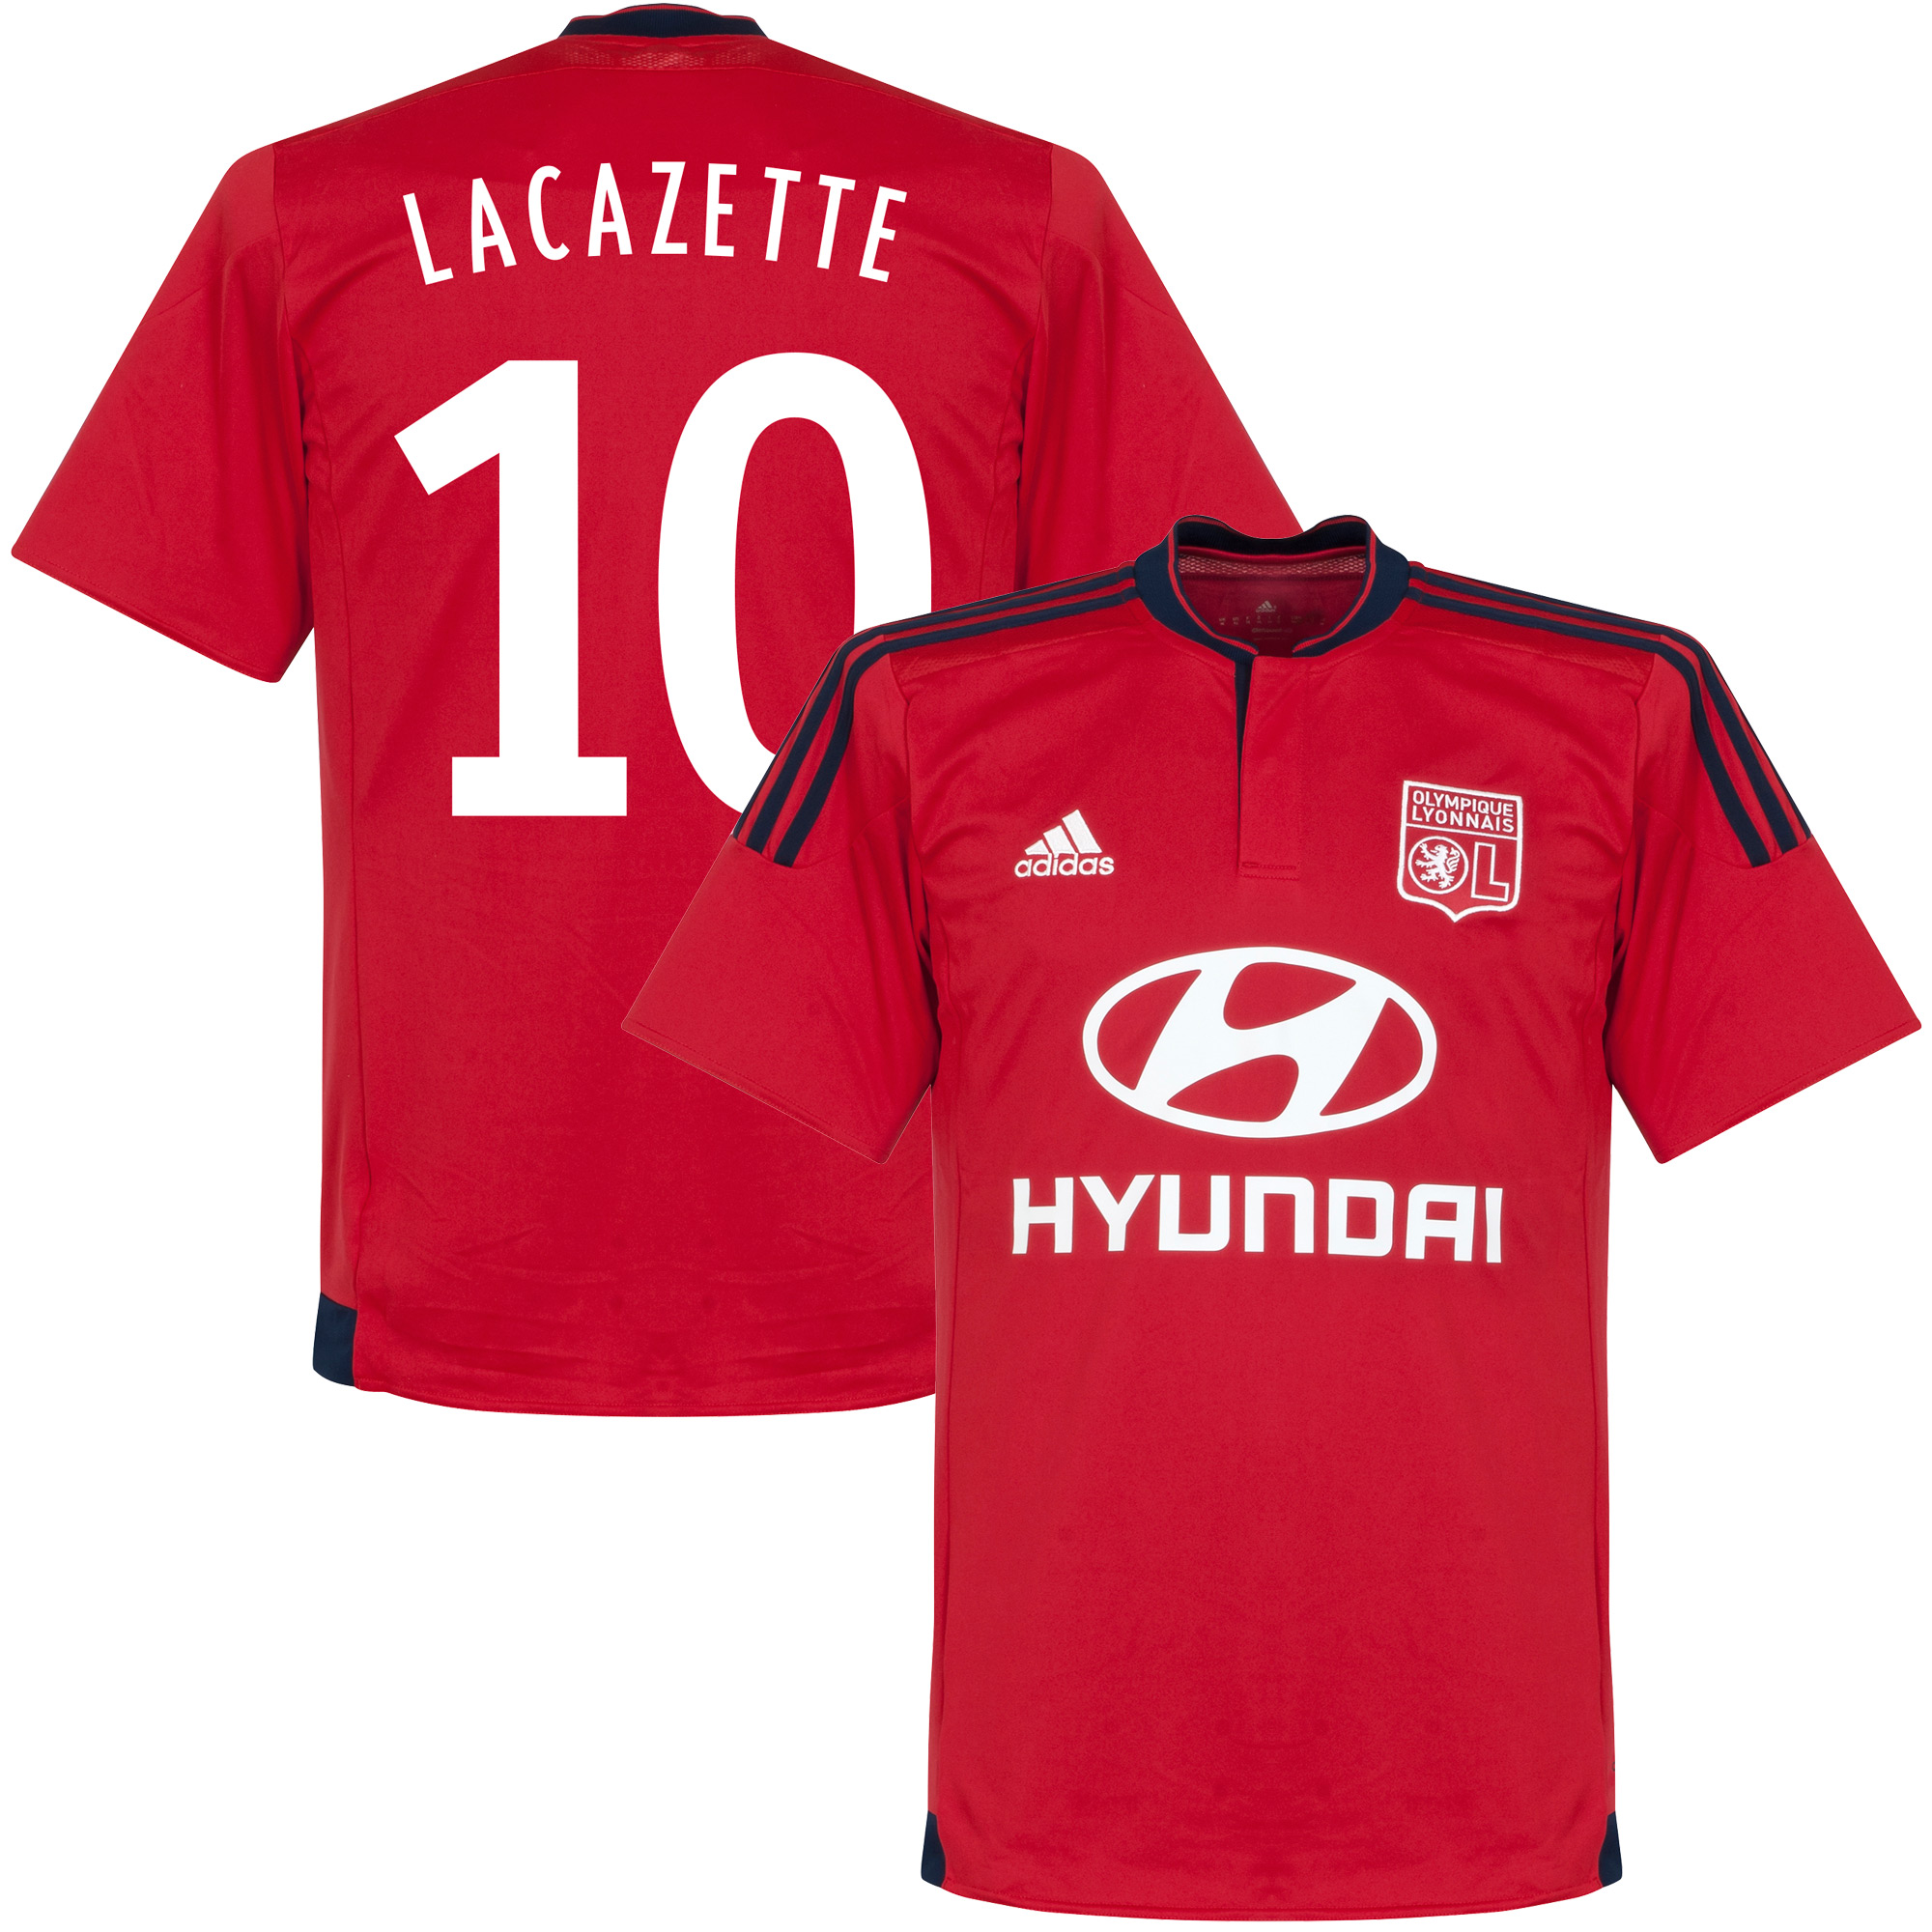 Olympique Lyon Away Lacazette Jersey 2015 / 2016 (Fan Style Printing) - 42